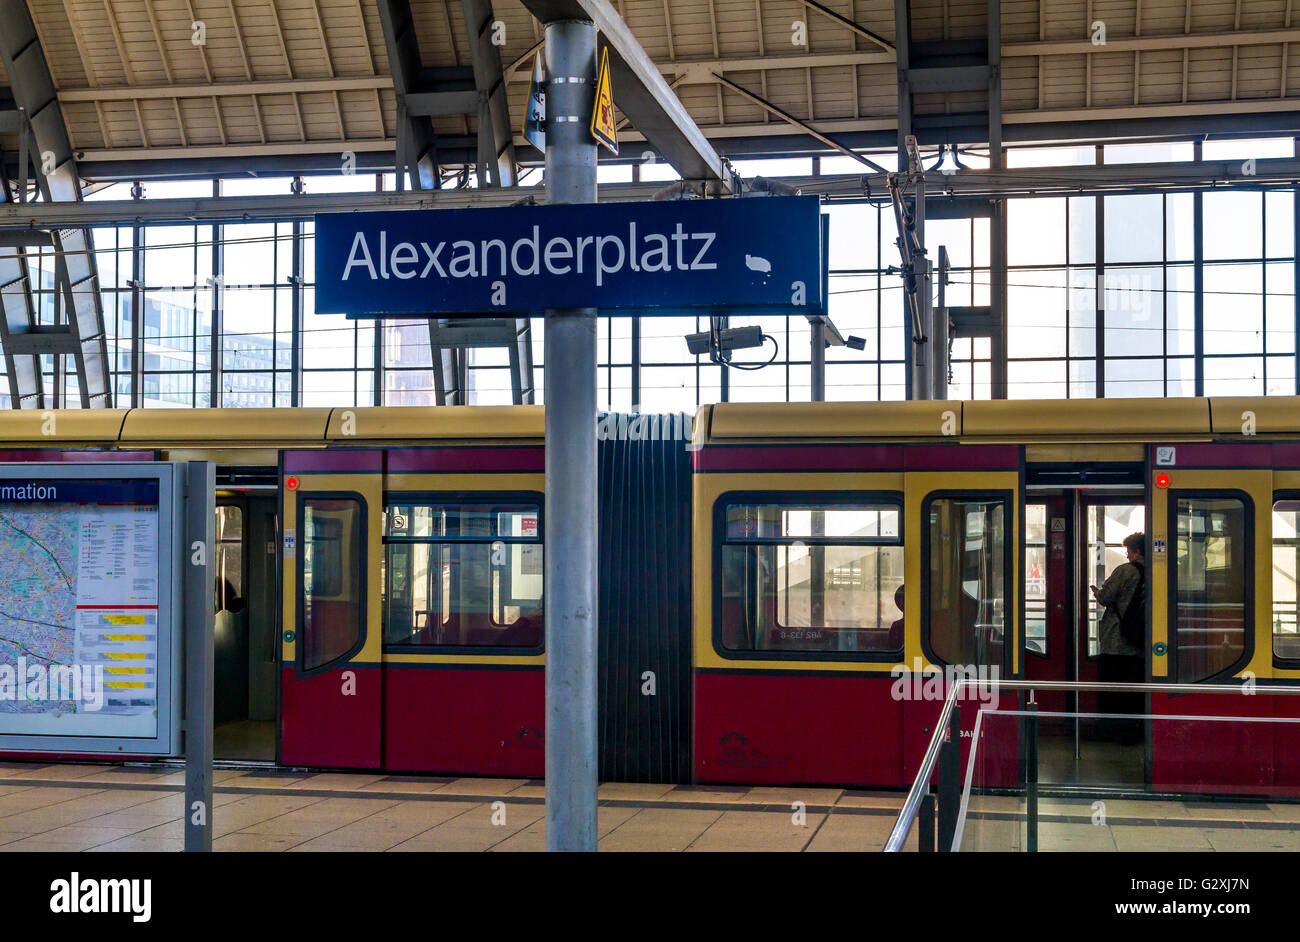 S-Bahn-Zug am Alexanderplatz Hauptbahnhof, Berlin, Deutschland Stockbild